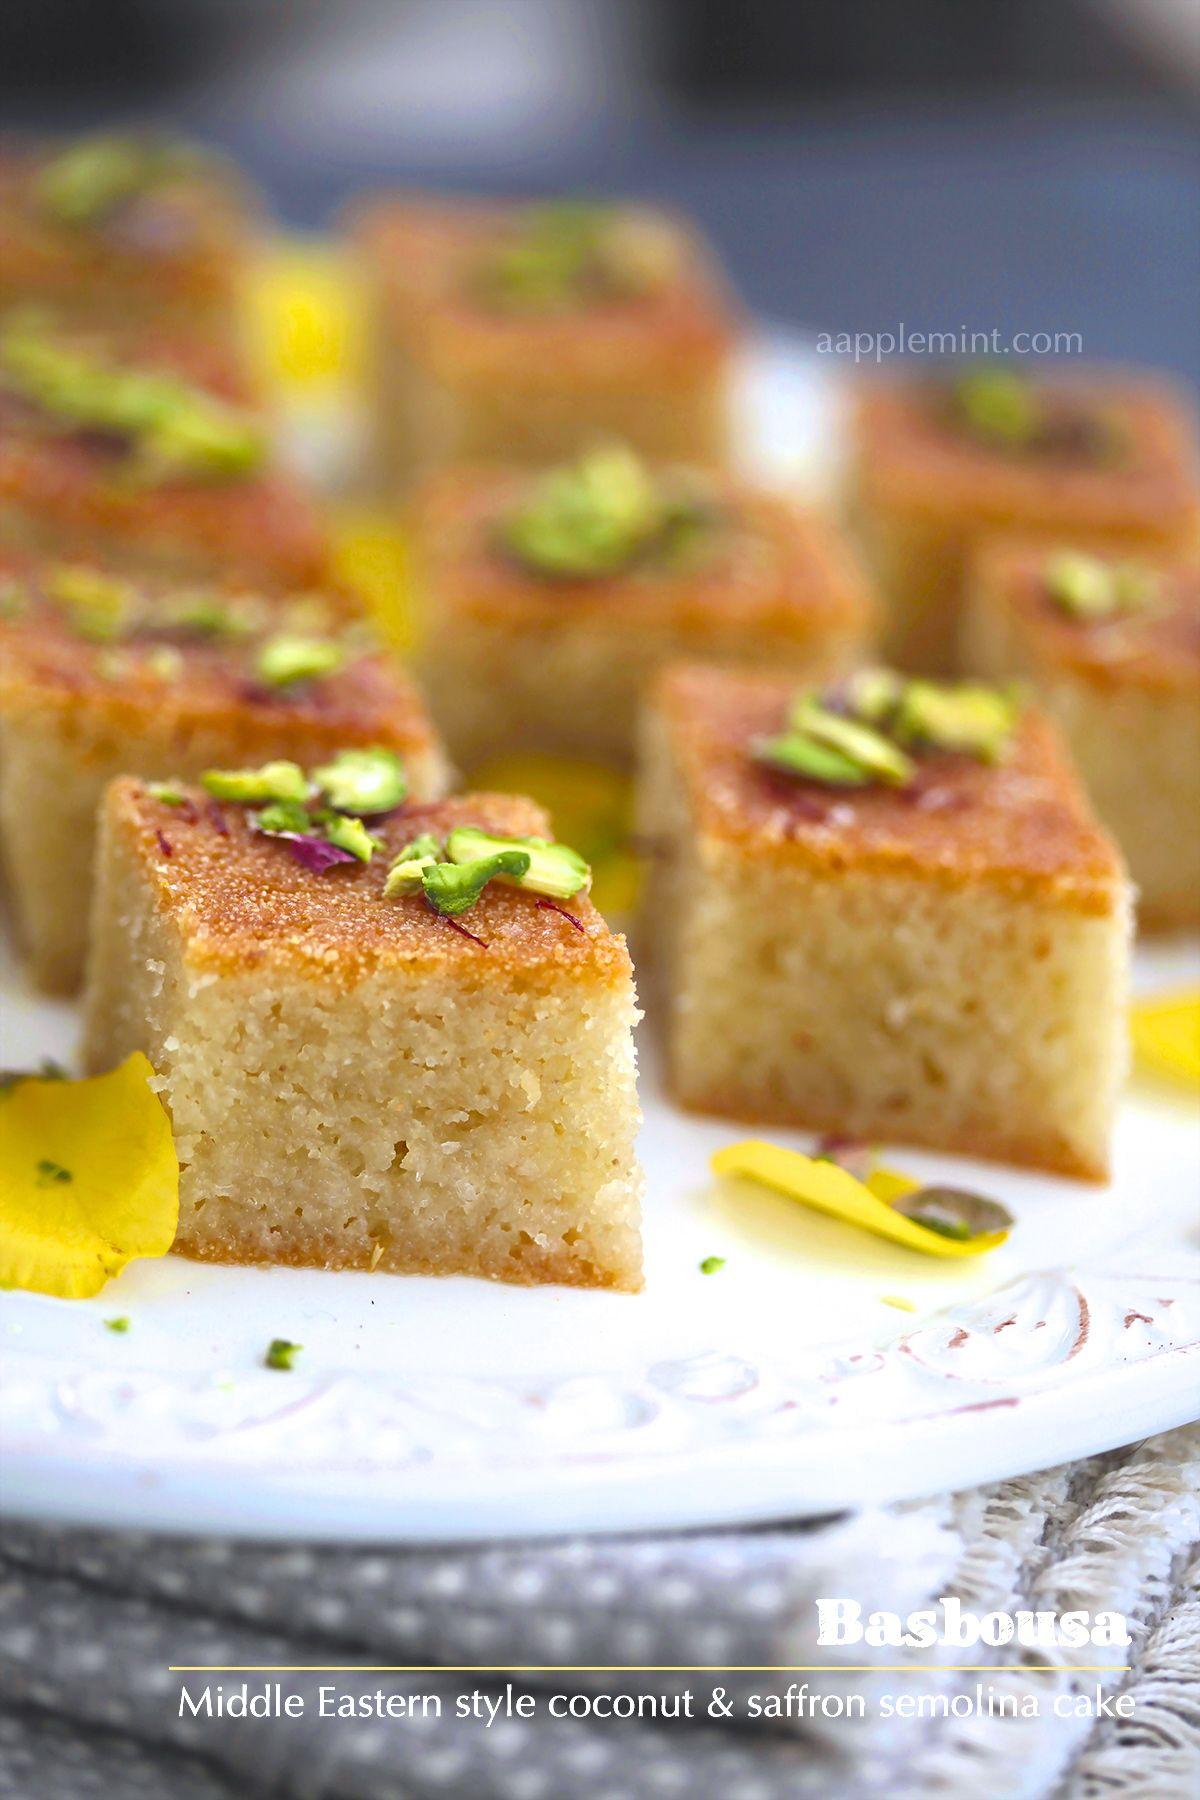 Saffron semolina cake for ramadan ramadandeen mosques saffron semolina cake for ramadan forumfinder Gallery